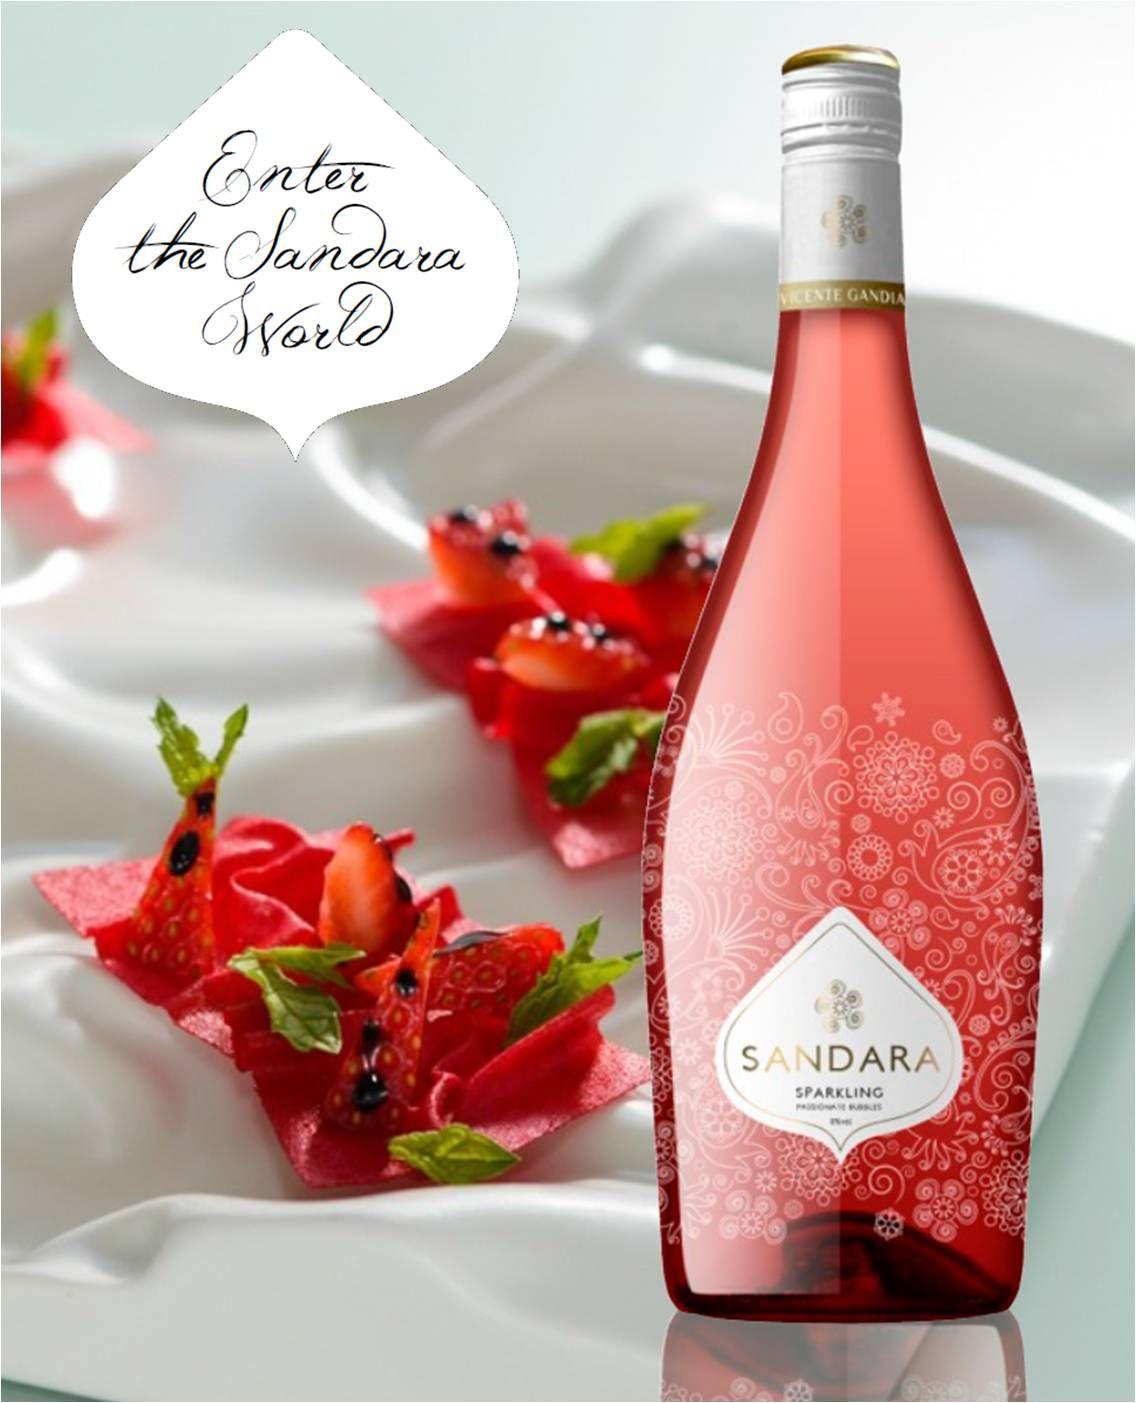 Sandara Rosado Un Vinoespumoso Bajo En Alcohol Elaborado Con Bobal Wine Bottle Rose Wine Bottle Alcohol